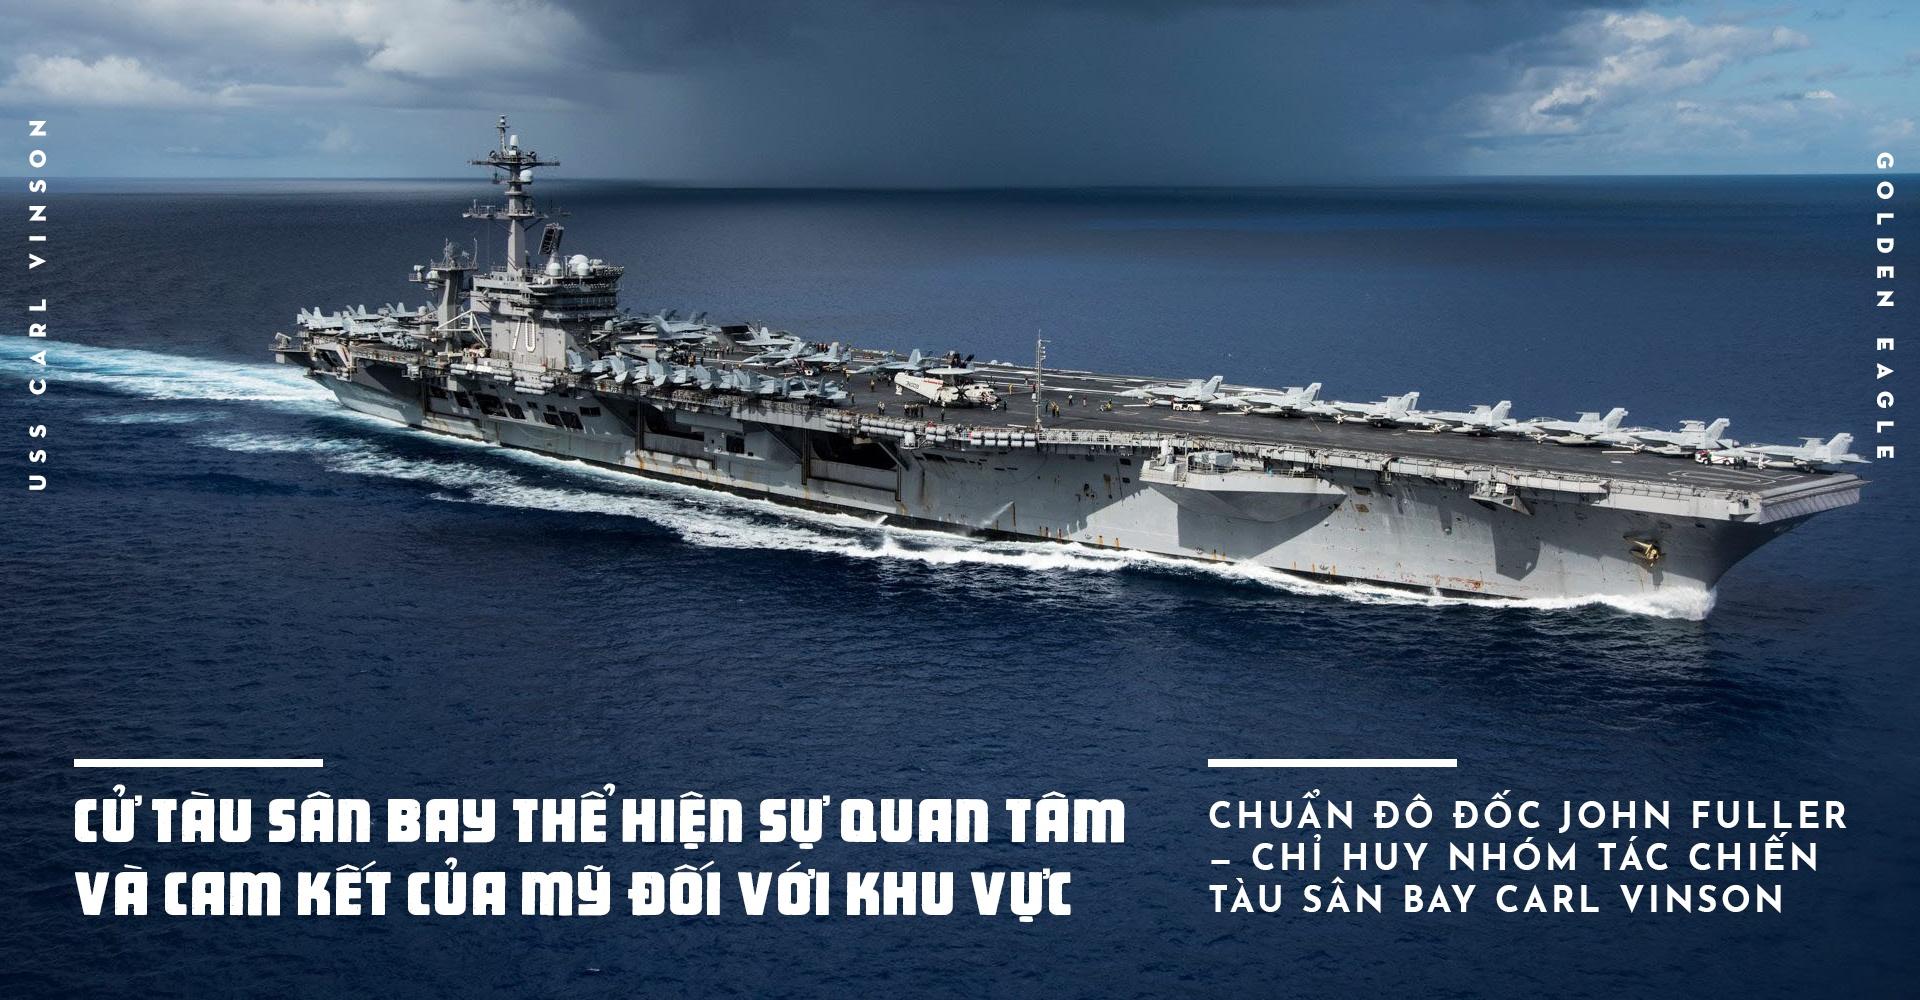 USS Carl Vinson toi Da Nang: Uy luc 'phao dai noi' tren bien hinh anh 10